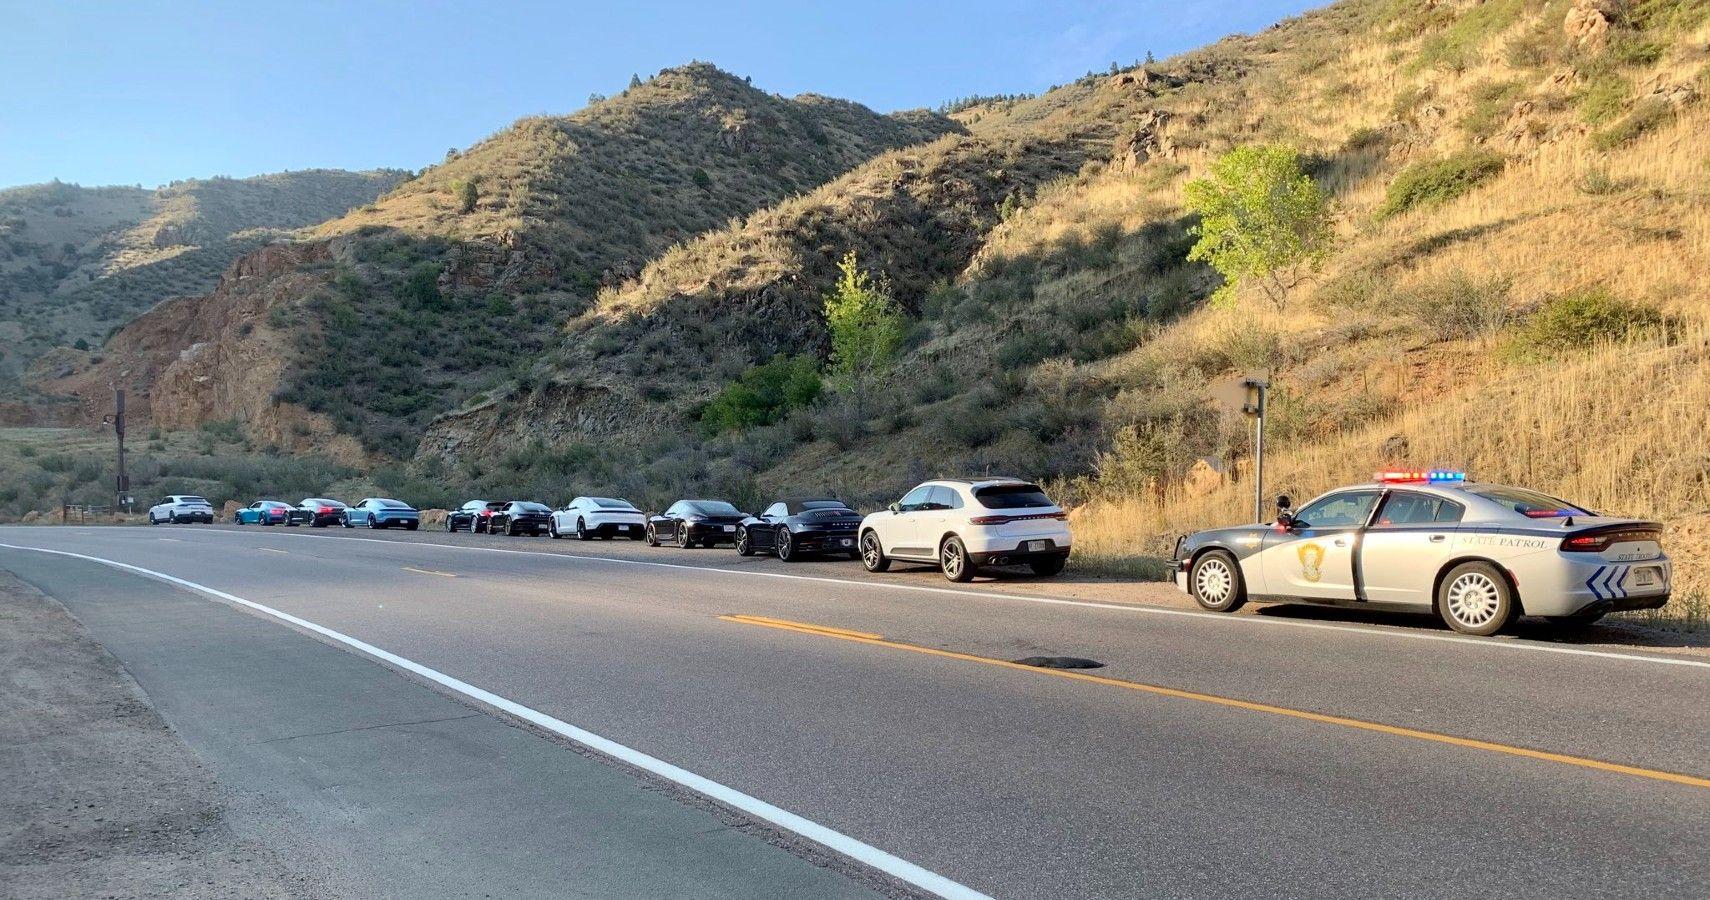 Busted: Single Trooper Tickets A 10 Car Porsche Caravan For Speeding